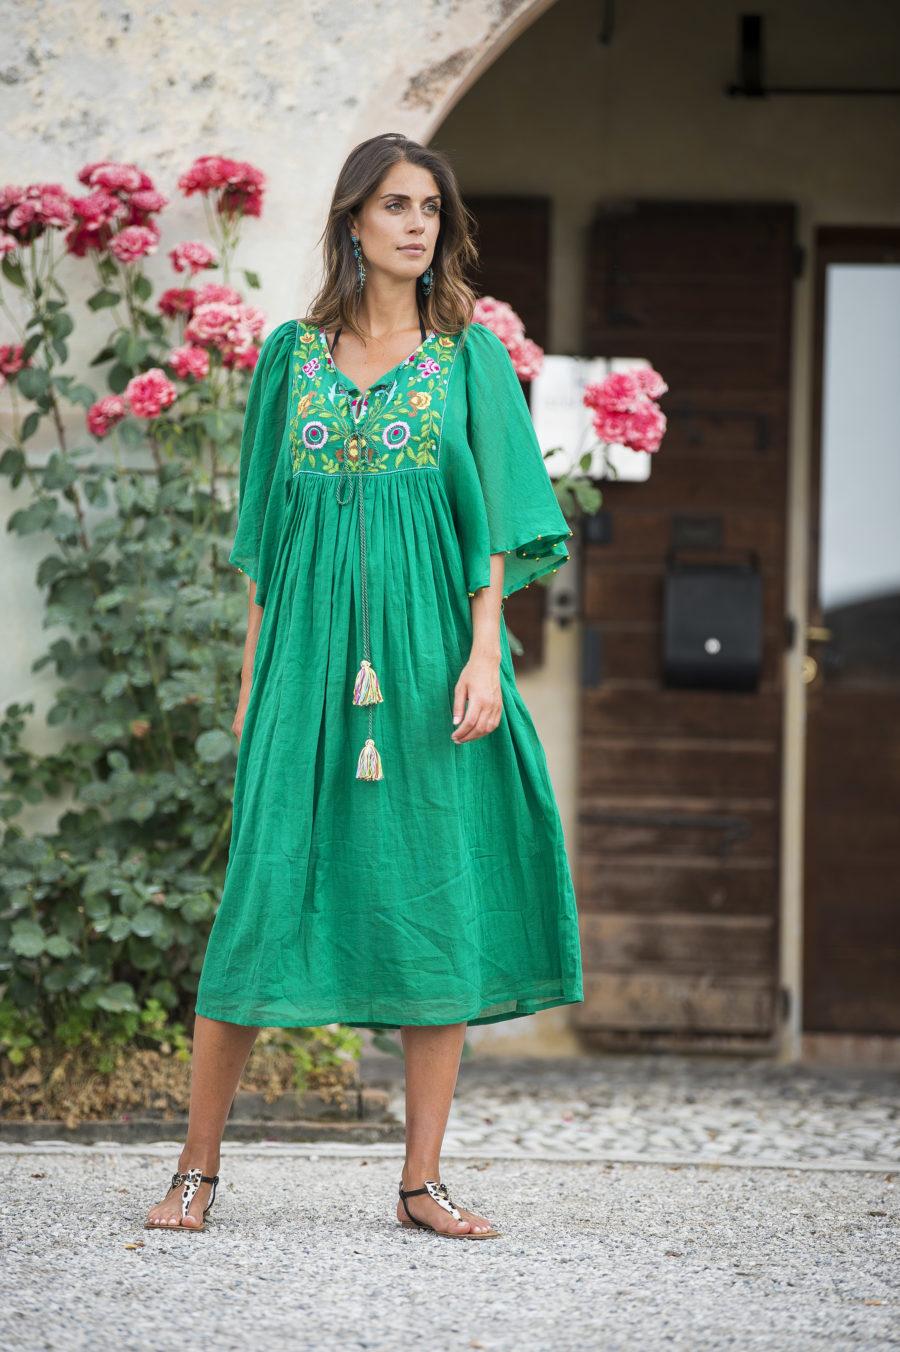 Caftano in cotone verde smeraldo ricamo floreale